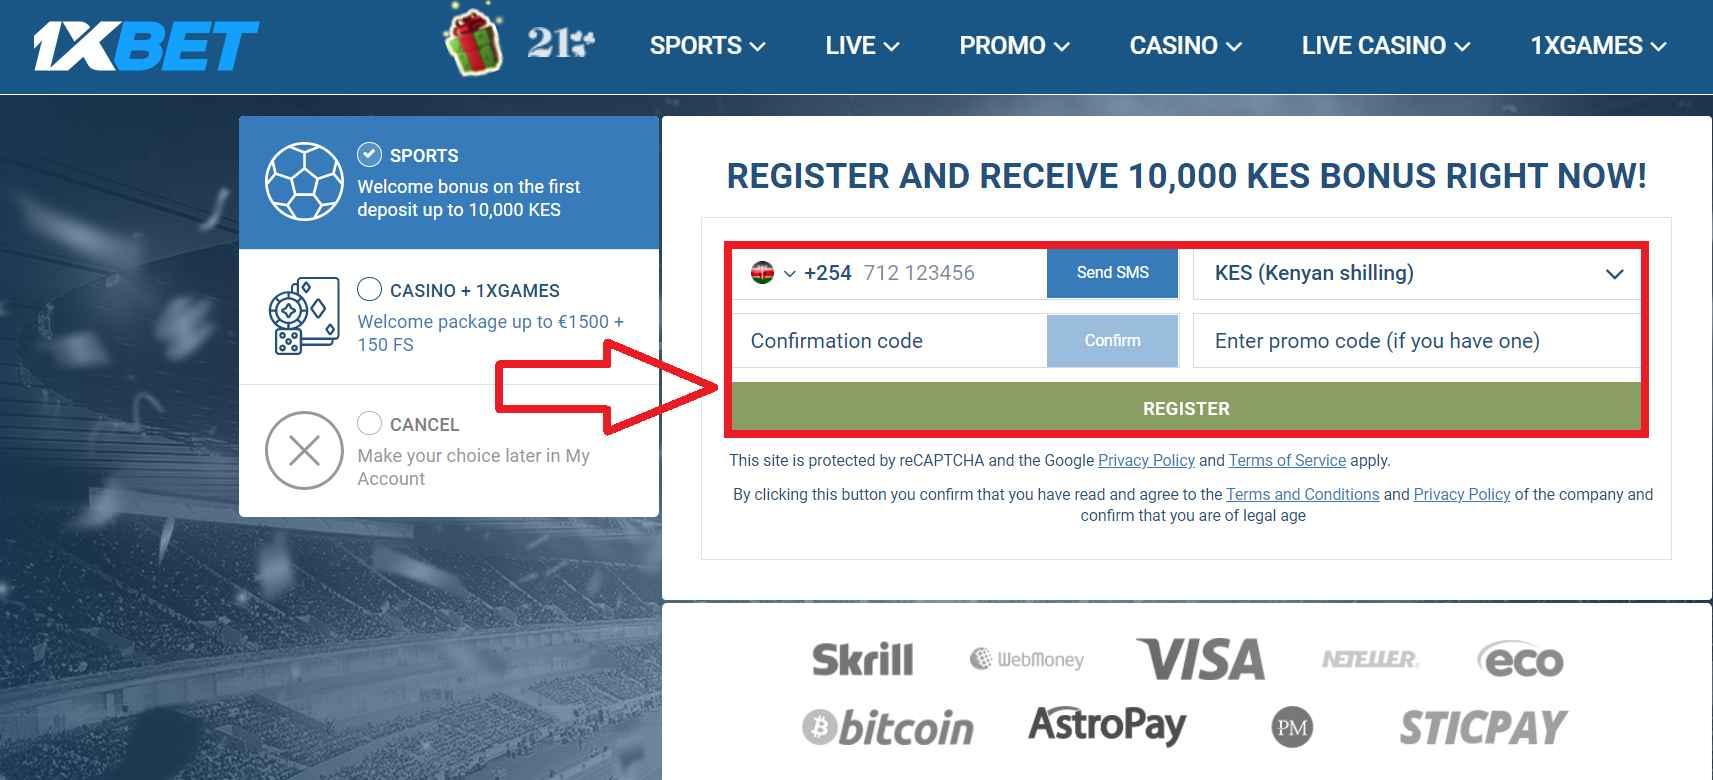 1xBet registration in Kenya